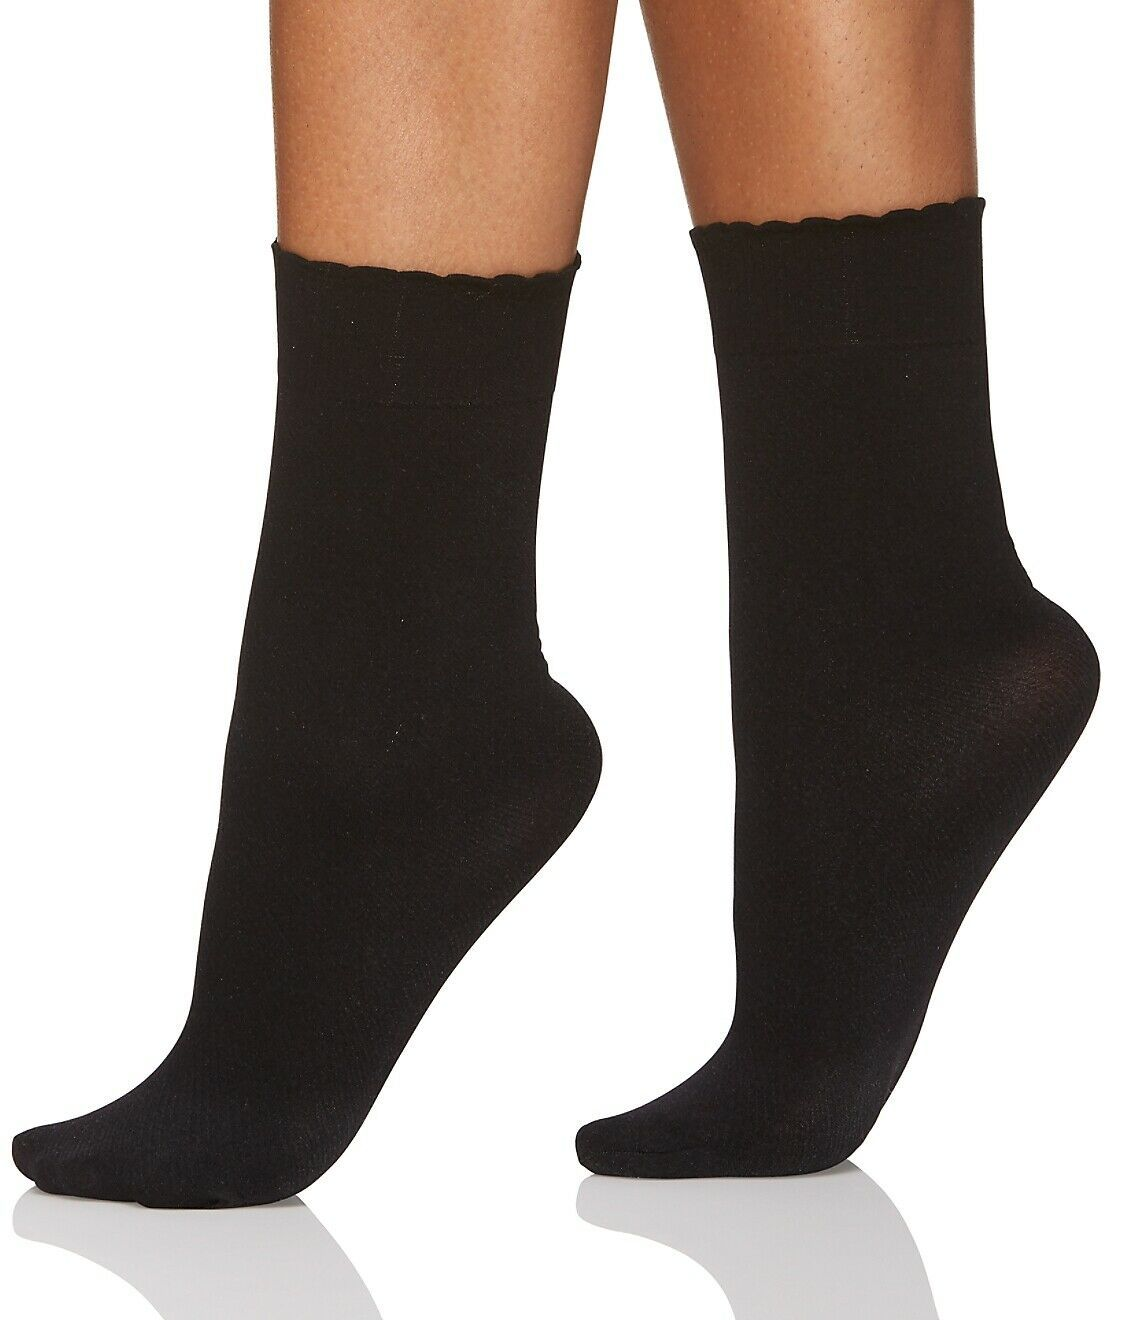 Berkshire BLACK Cozy Hose Plush Lined Scalloped Anklet, US Plus(9-12) image 3